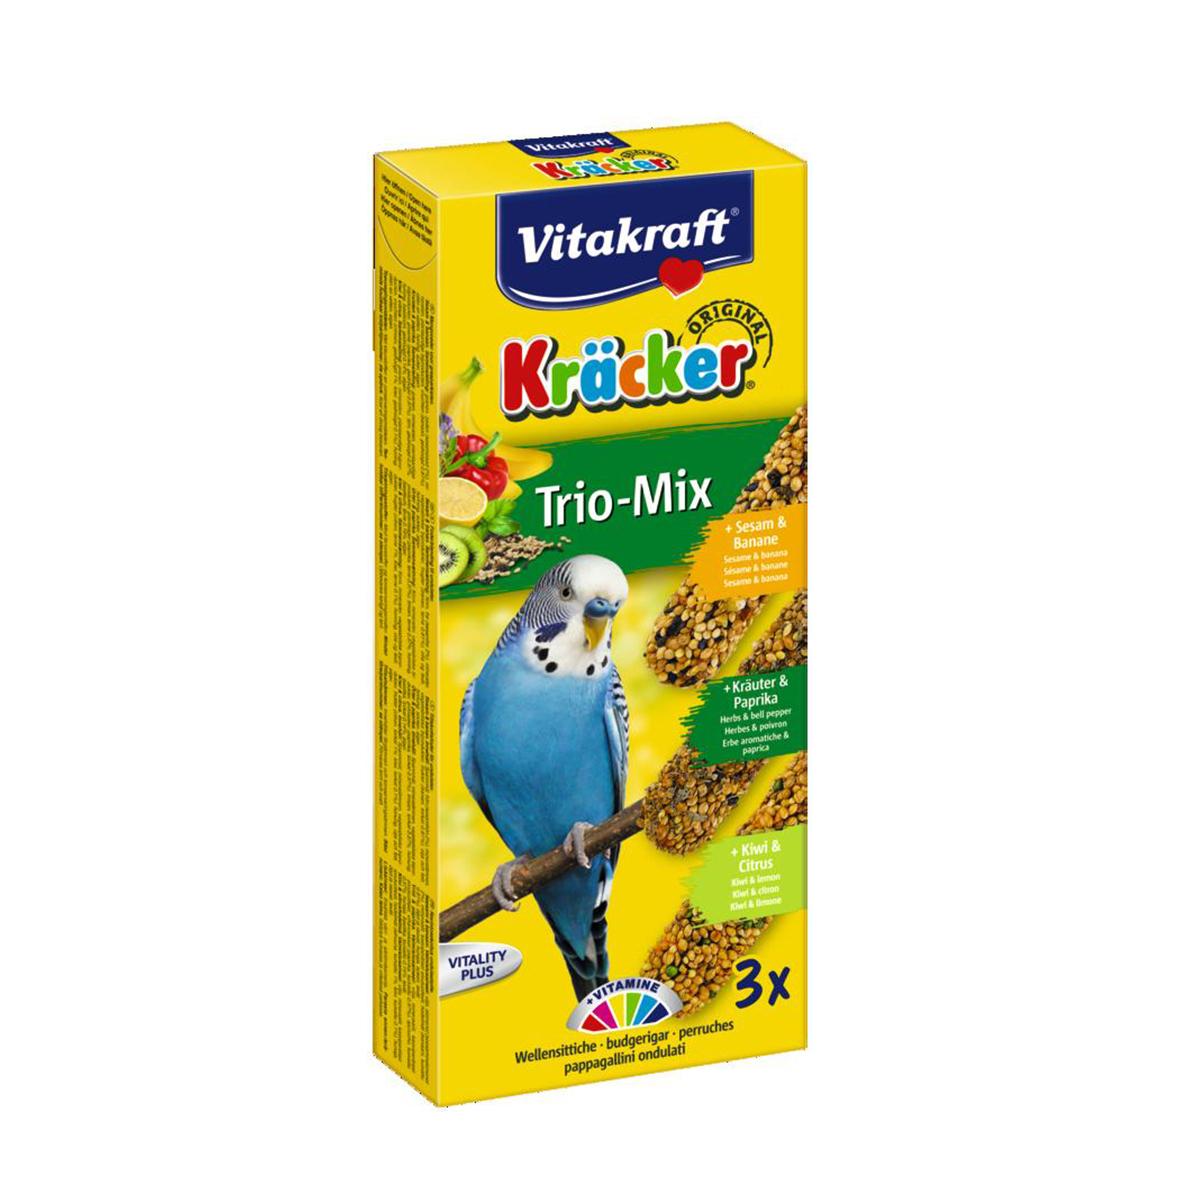 Vitakraft Trio Mix Kräcker Vogelsnack Parkiet 3in1 Banaan-Kruiden-Kiwi